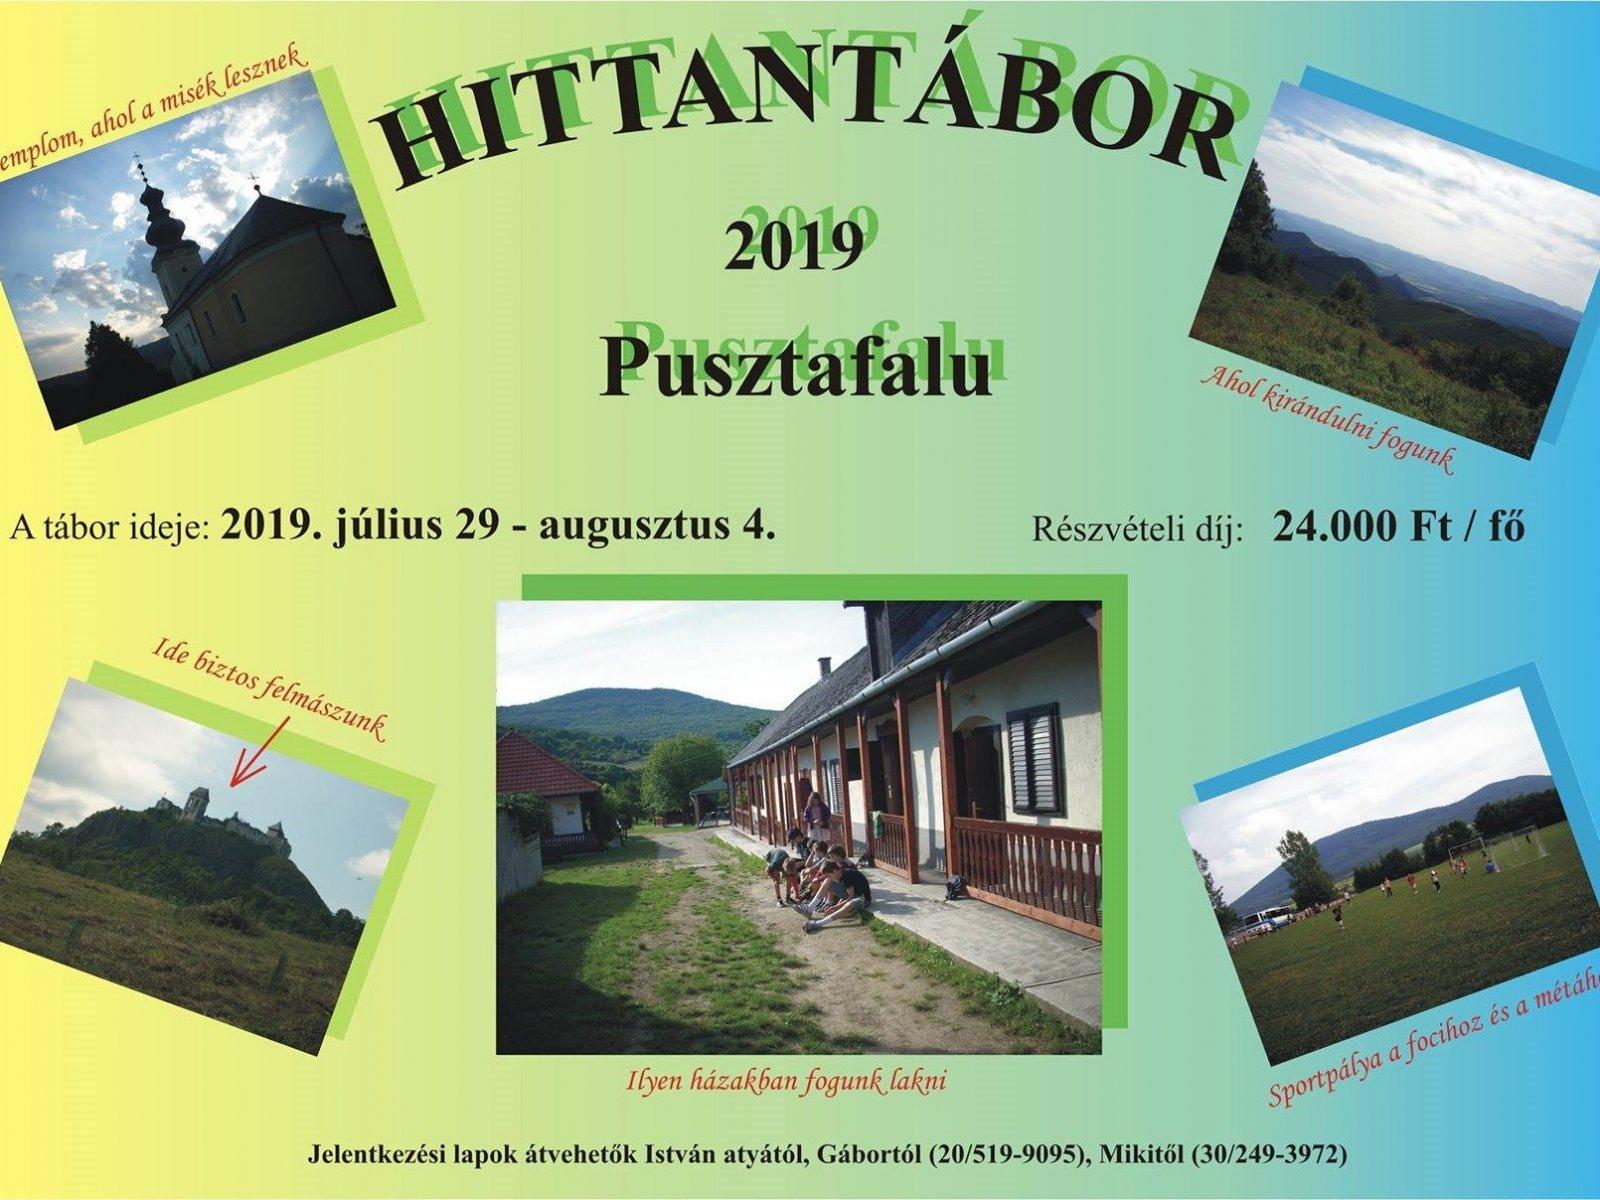 Hittantábor - 2019